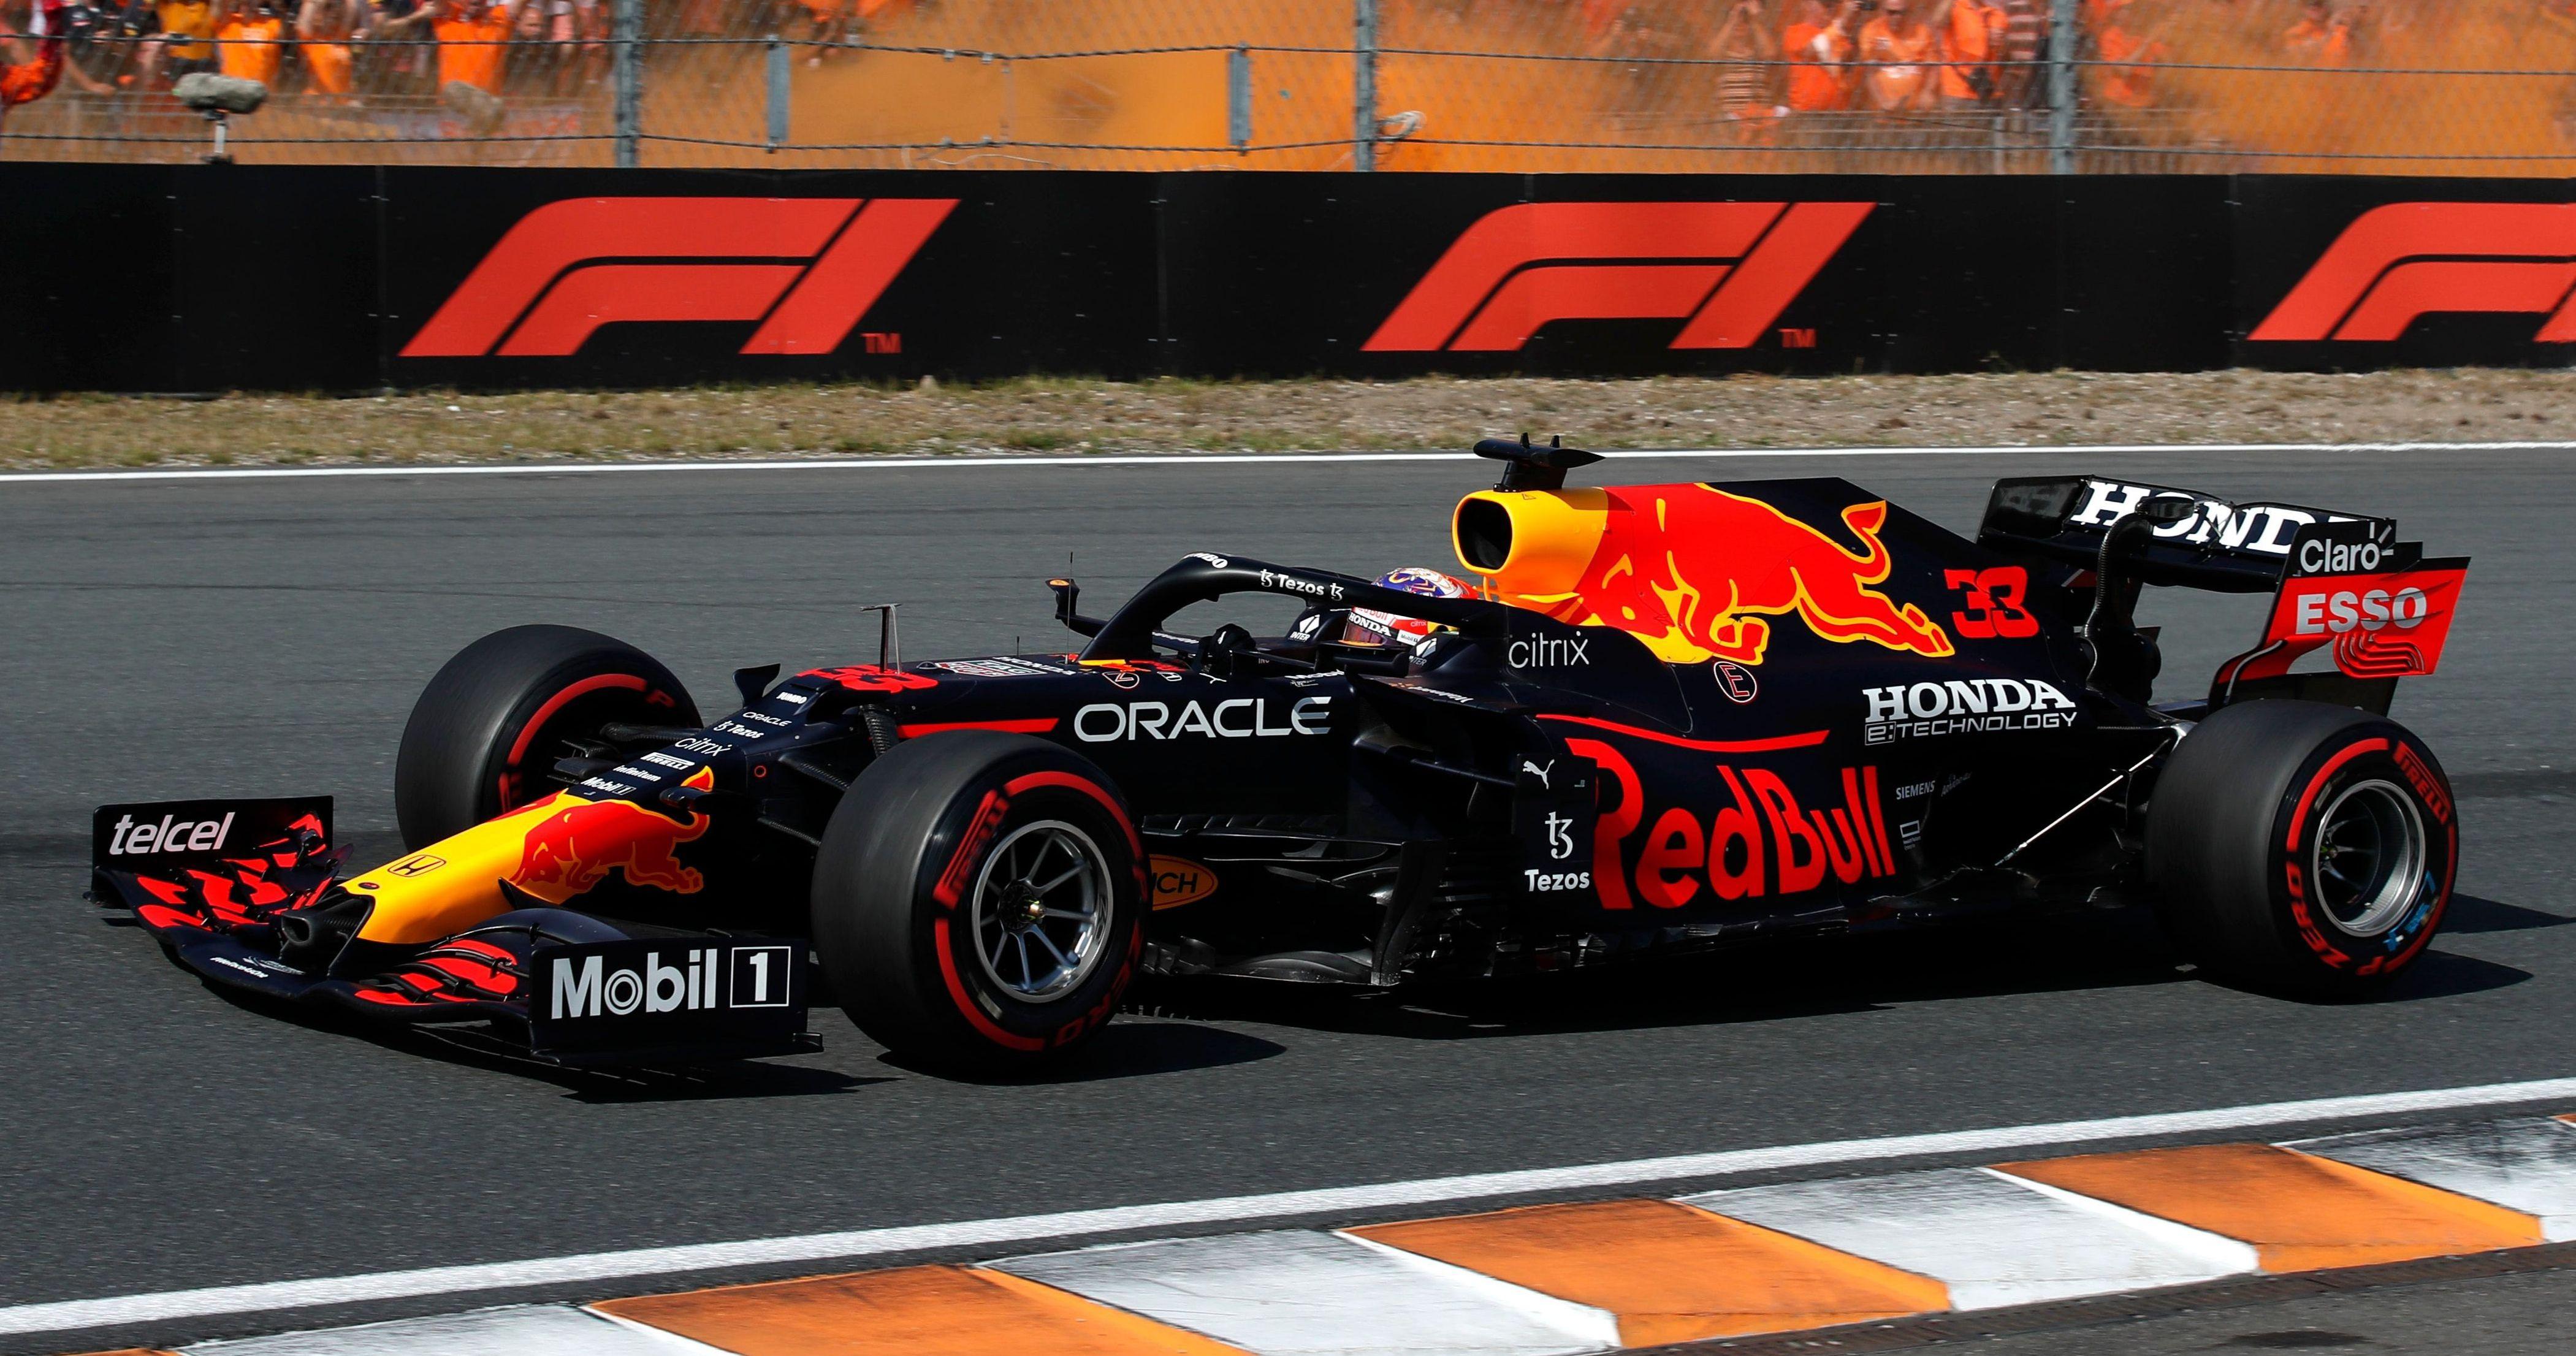 2021 Dutch Grand Prix: Stats Review